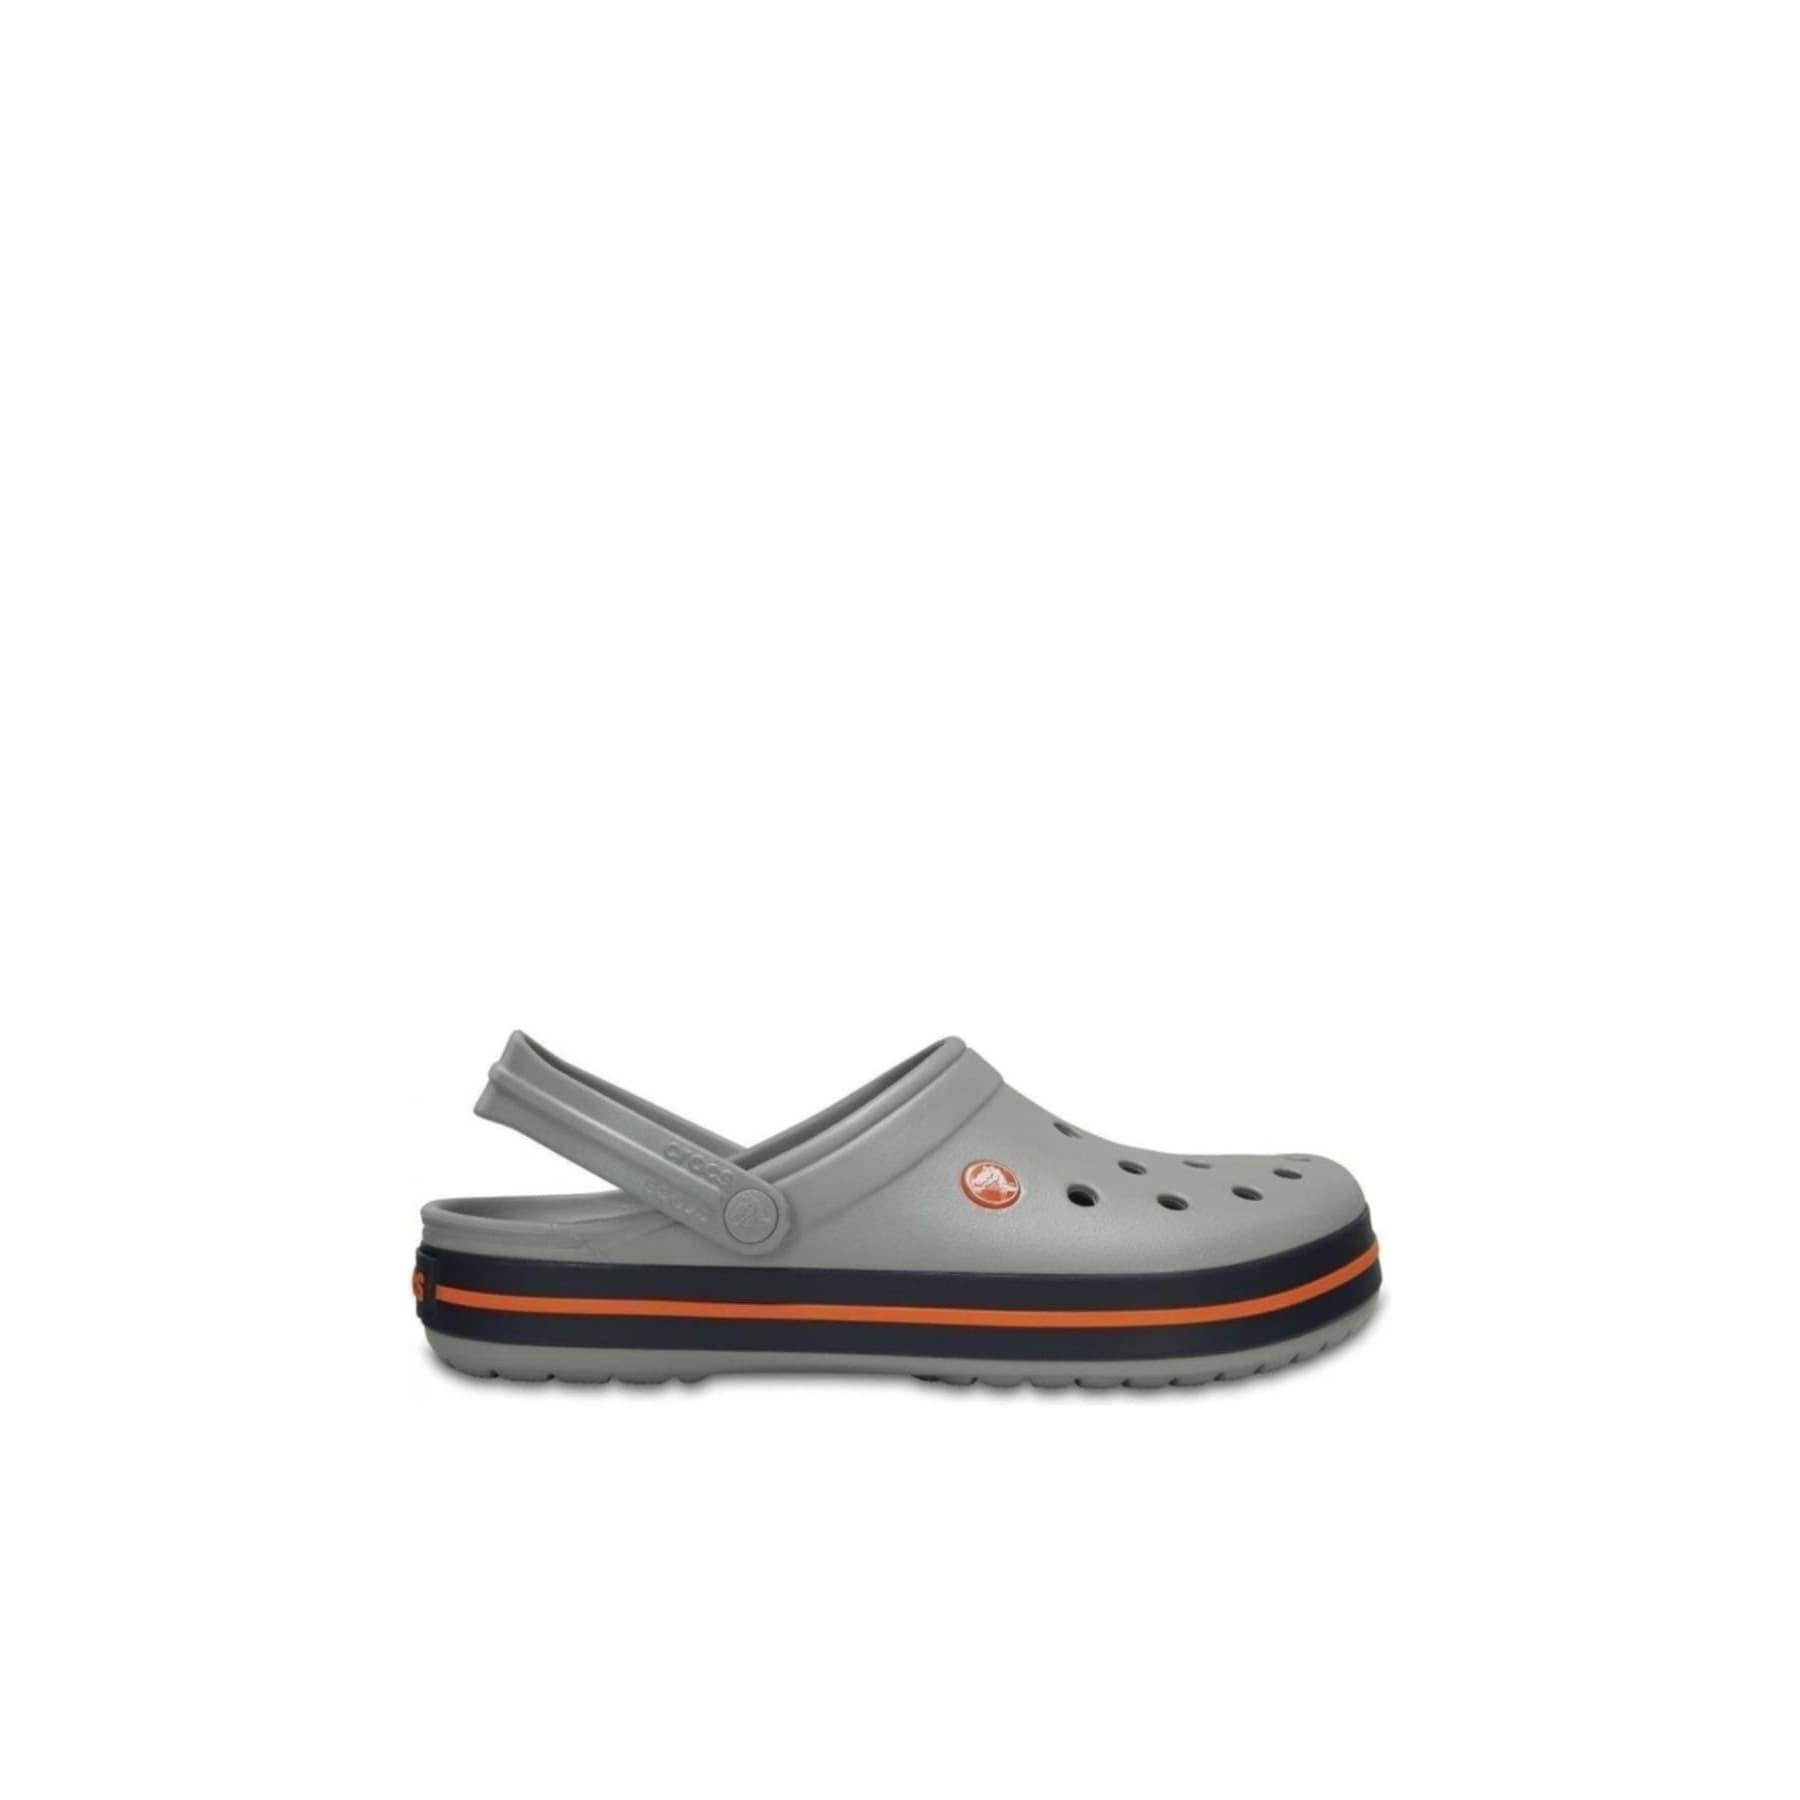 Crocs Crocband Erkek Gri Terlik (11016-01U)